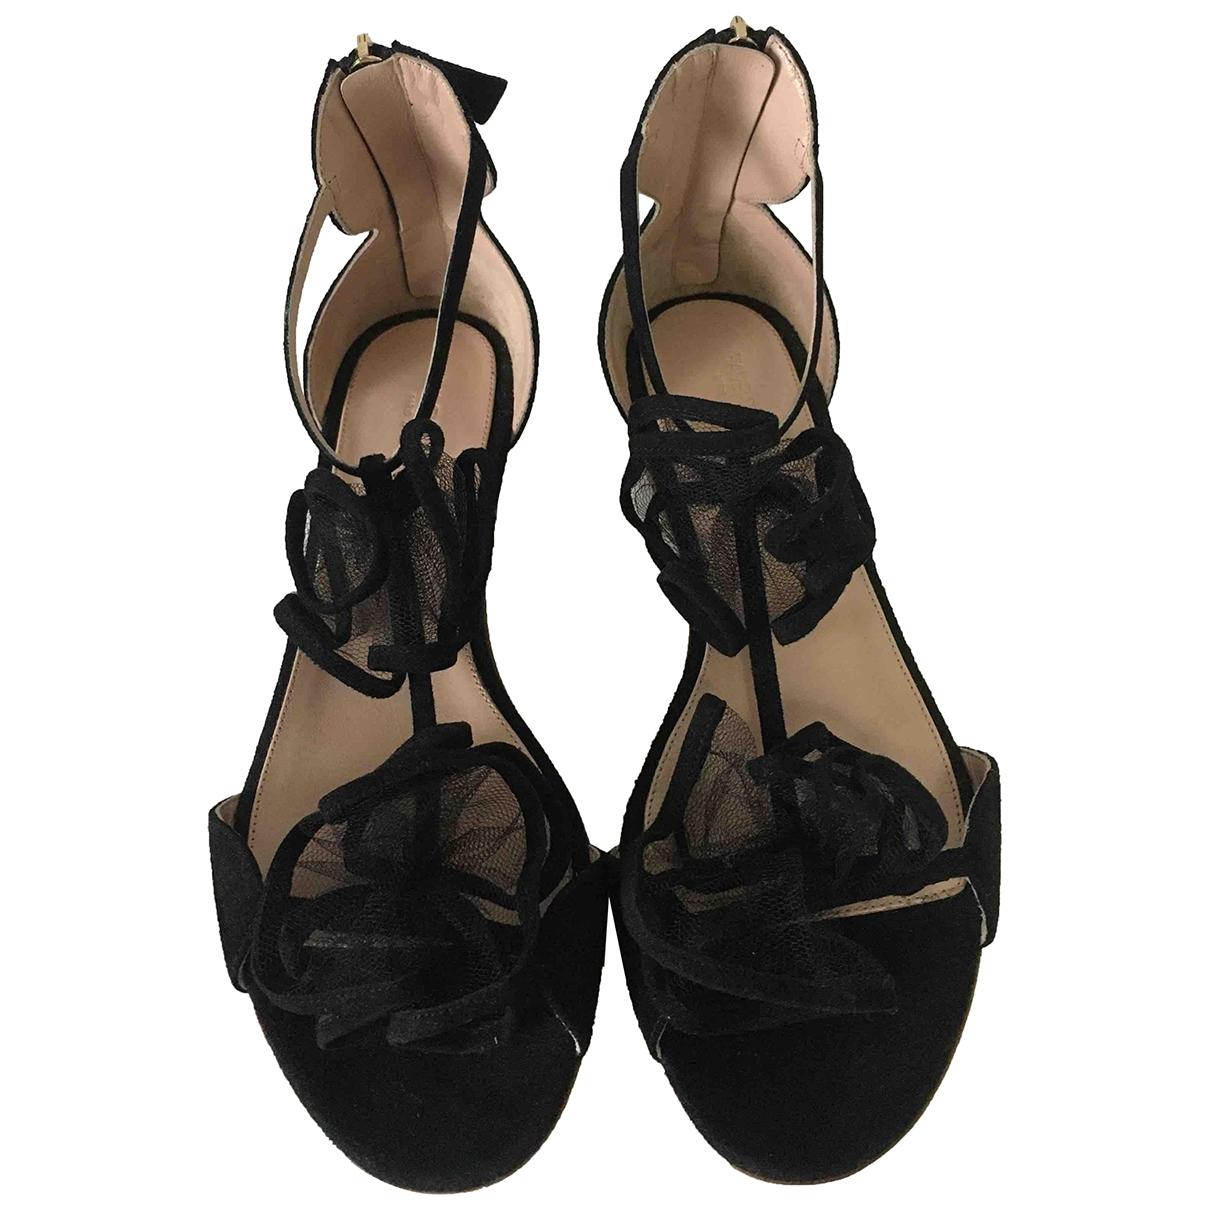 Giambattista Valli \N Black Suede Sandals for Women 39 EU